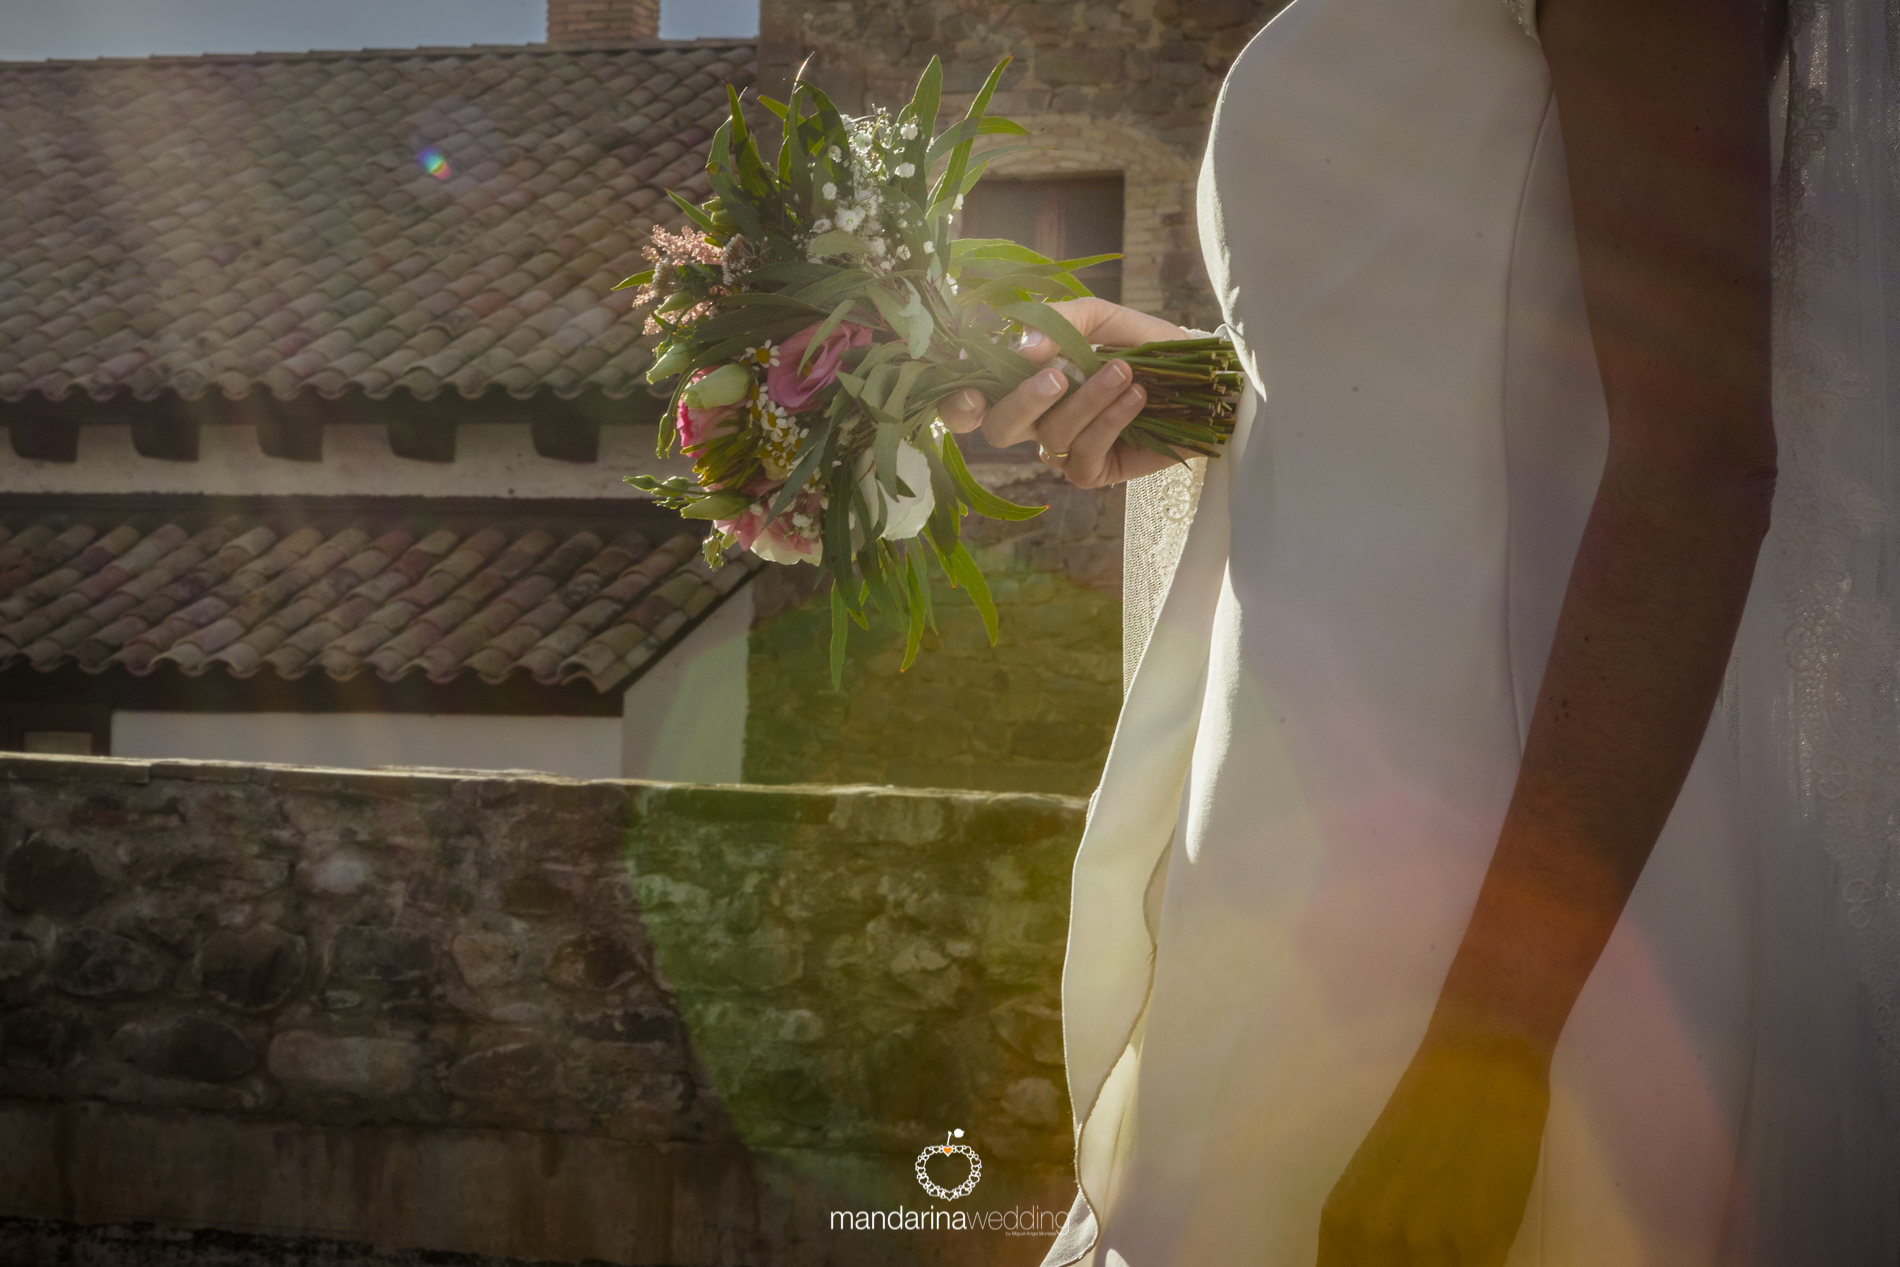 mandaria wedding, fotografos de boda, fotoperiodismo de boda, mejores fotografos de boda, bodas soria, bodas pirineo, bodas Madrid, fotógrafos tarragona_25